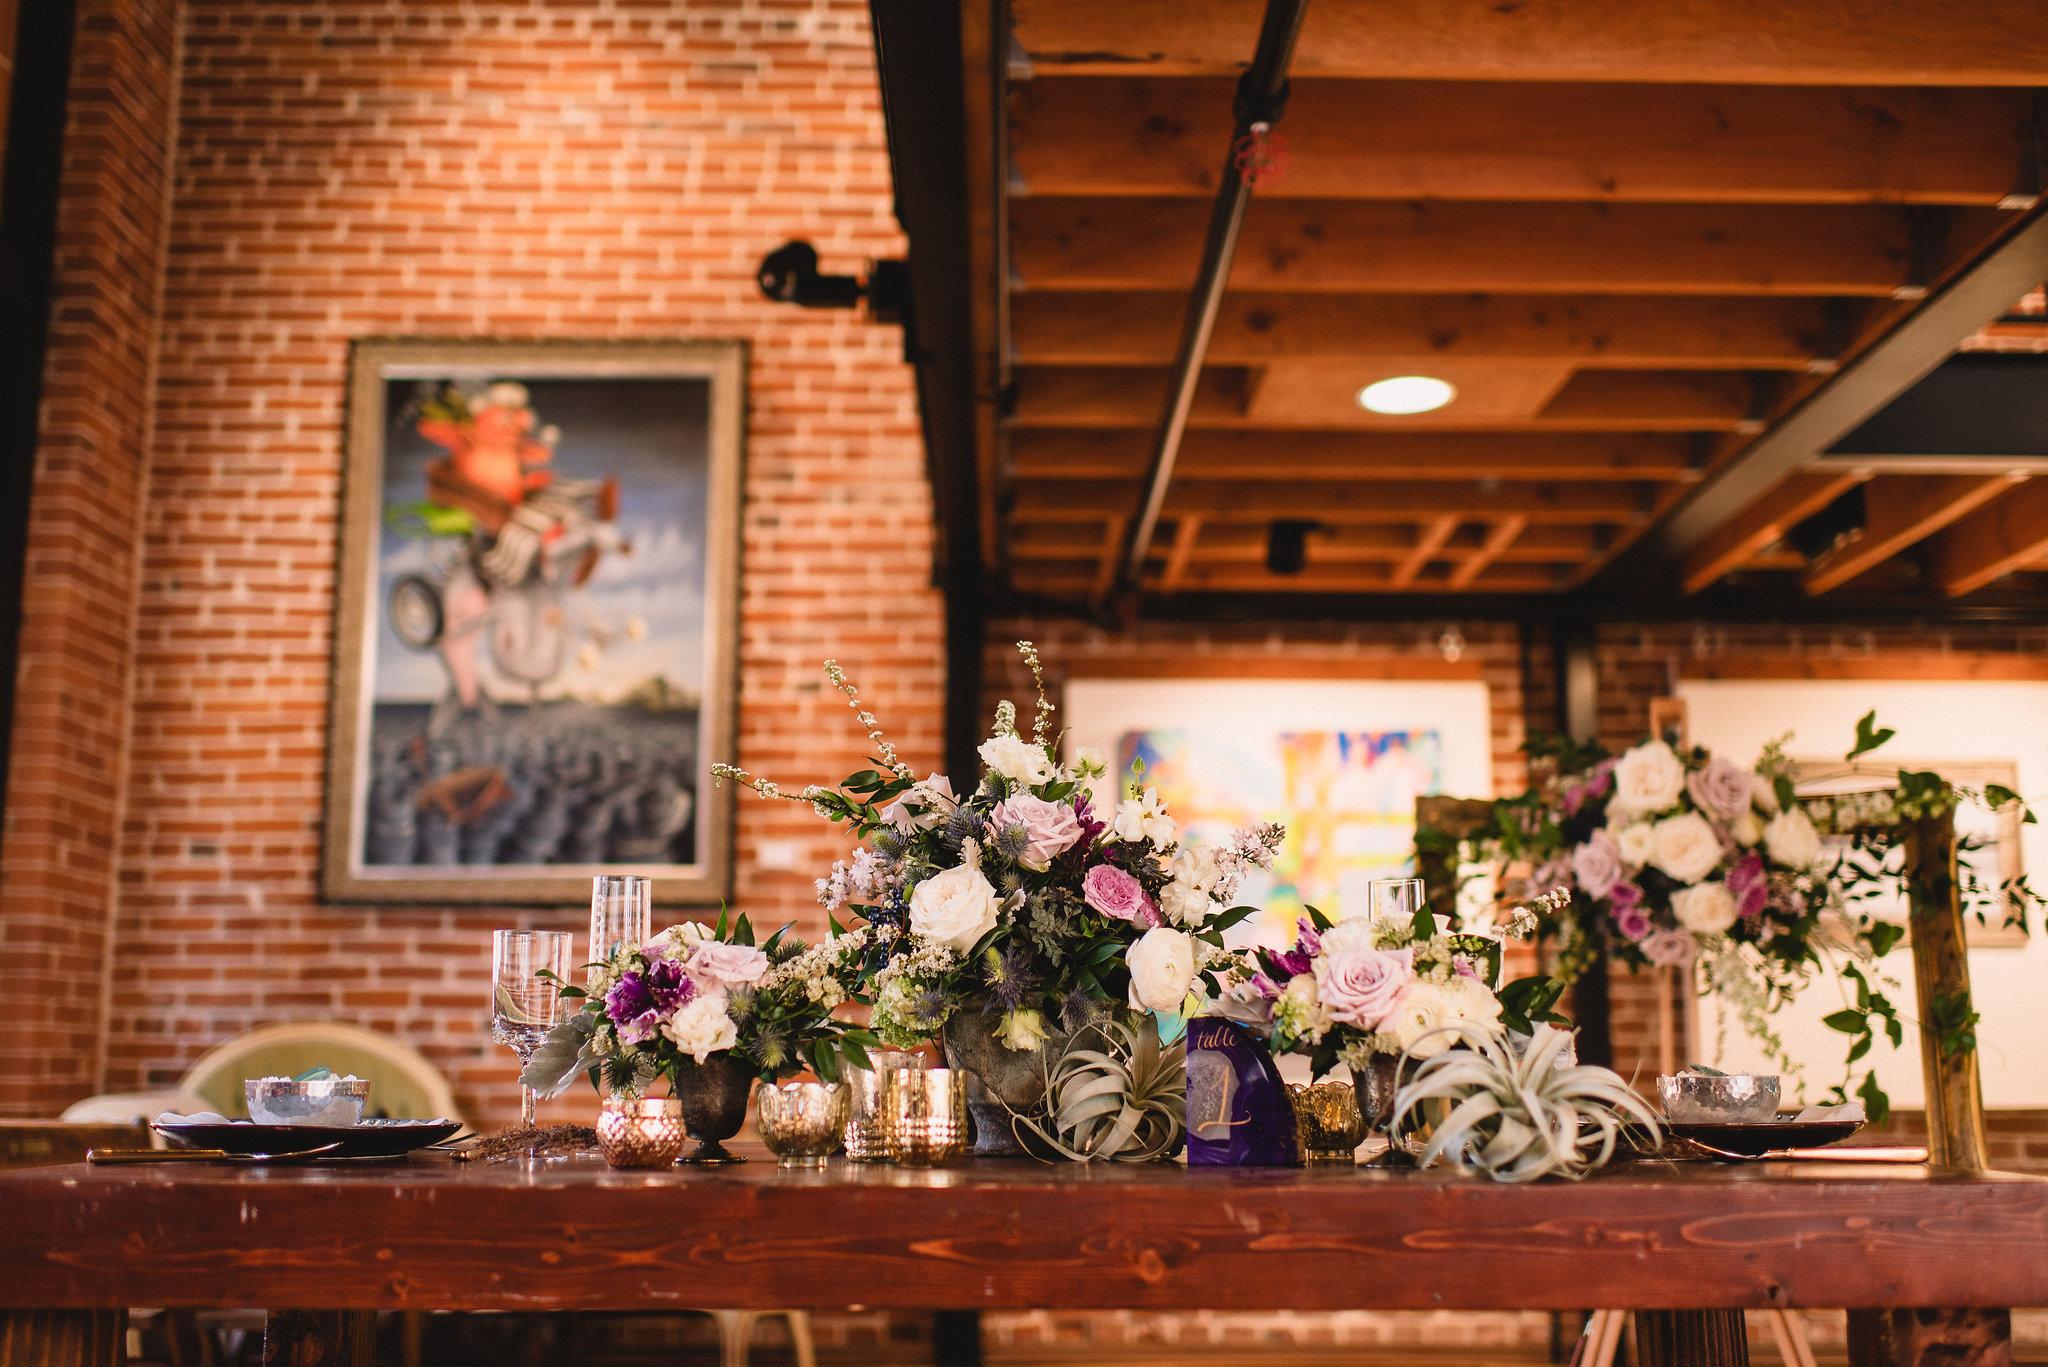 Sparks-gallery-wedding-photos-43.jpg